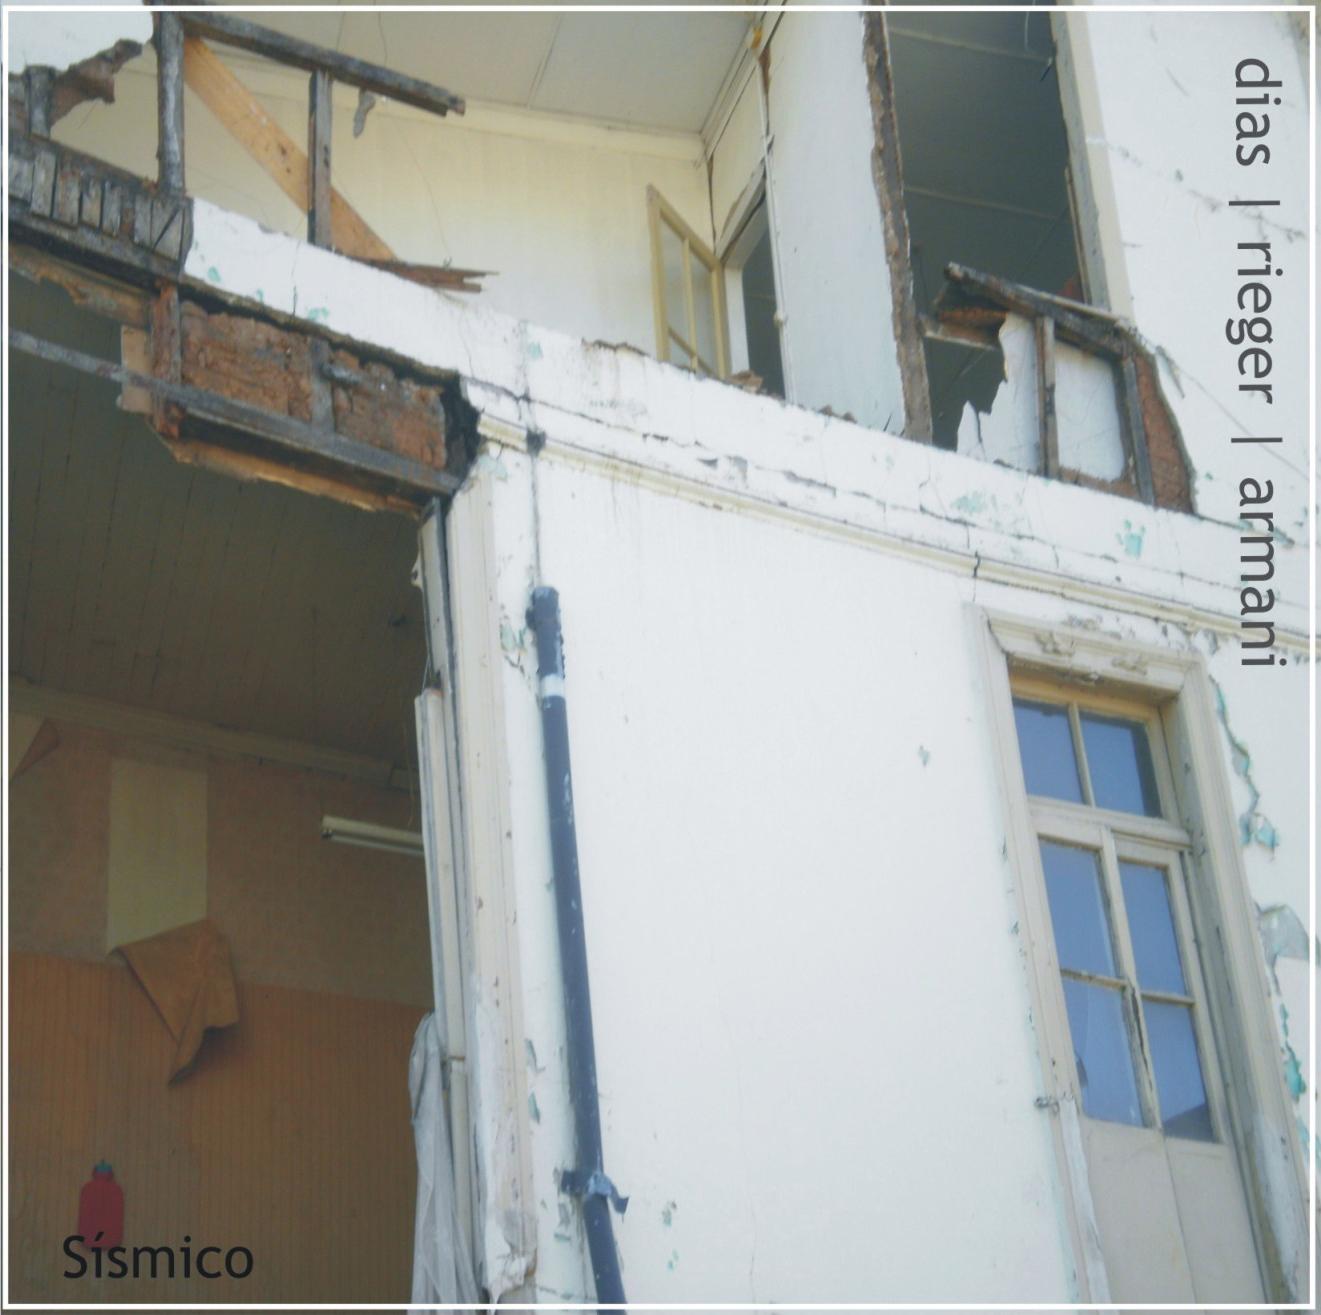 MSRCD005 - Dias | Rieger | Armani - Sísmico